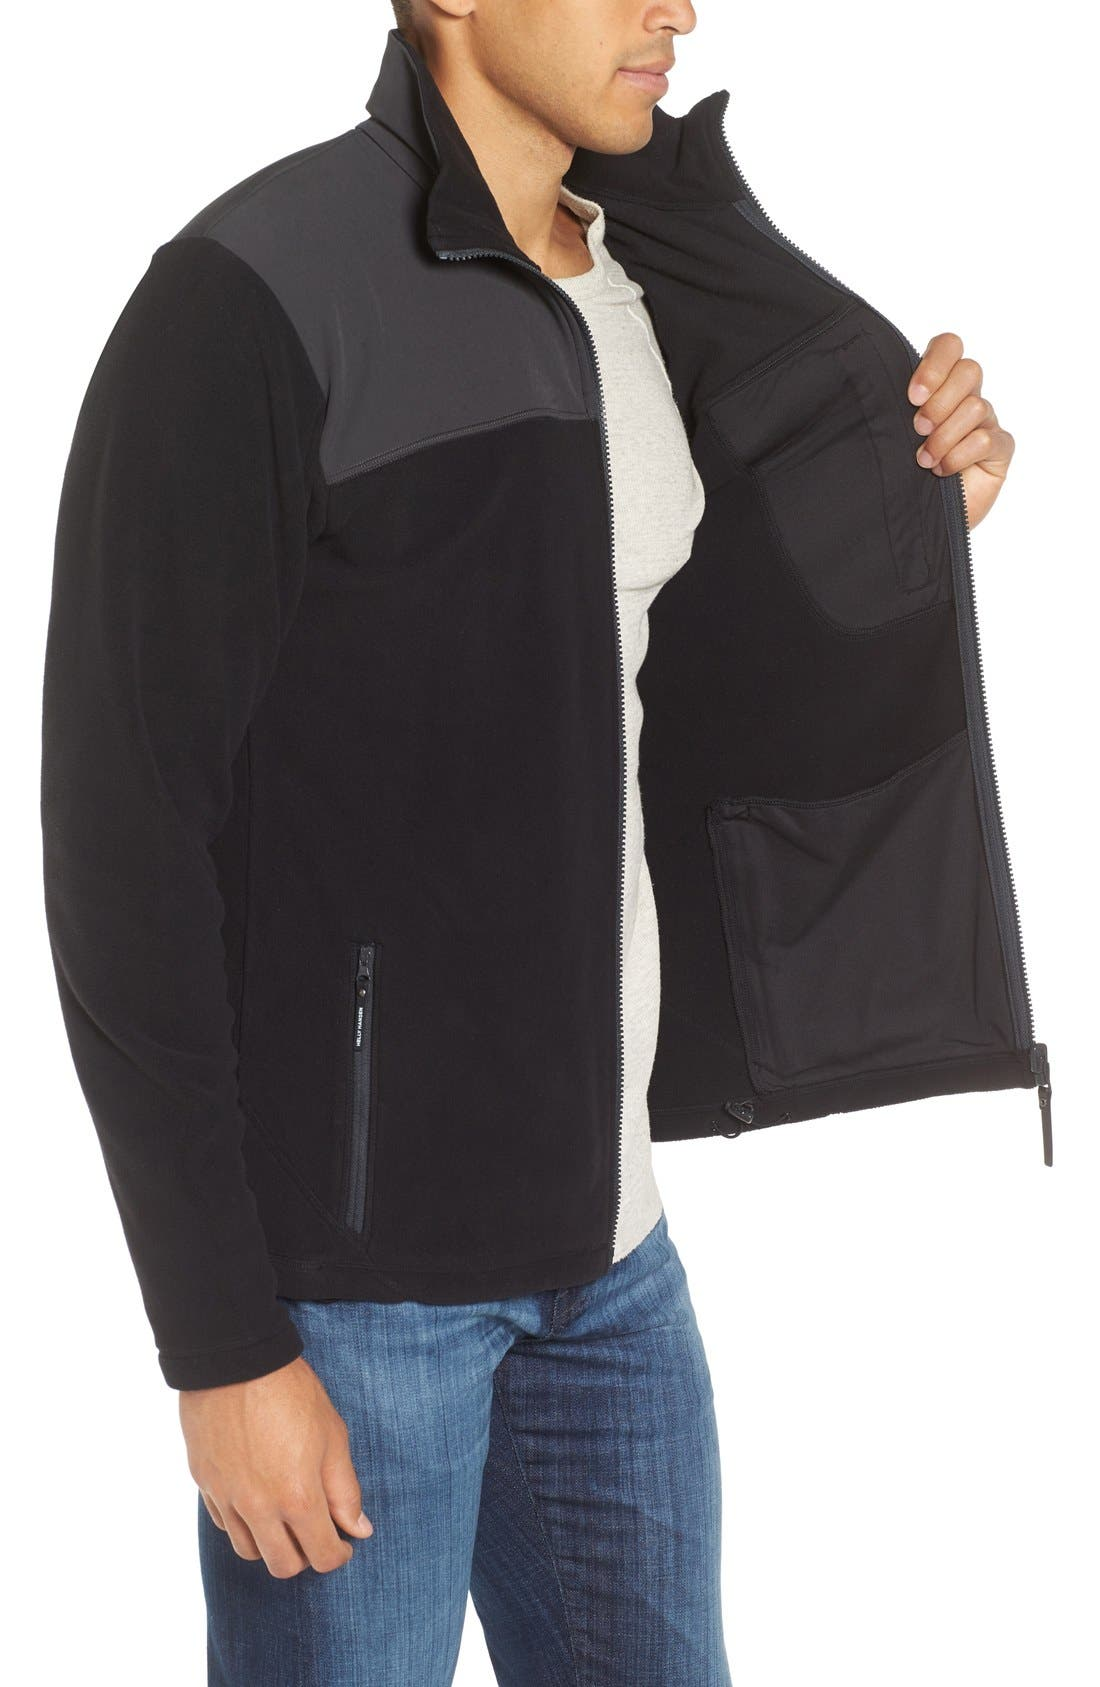 Sitka Fleece Jacket,                             Alternate thumbnail 3, color,                             001